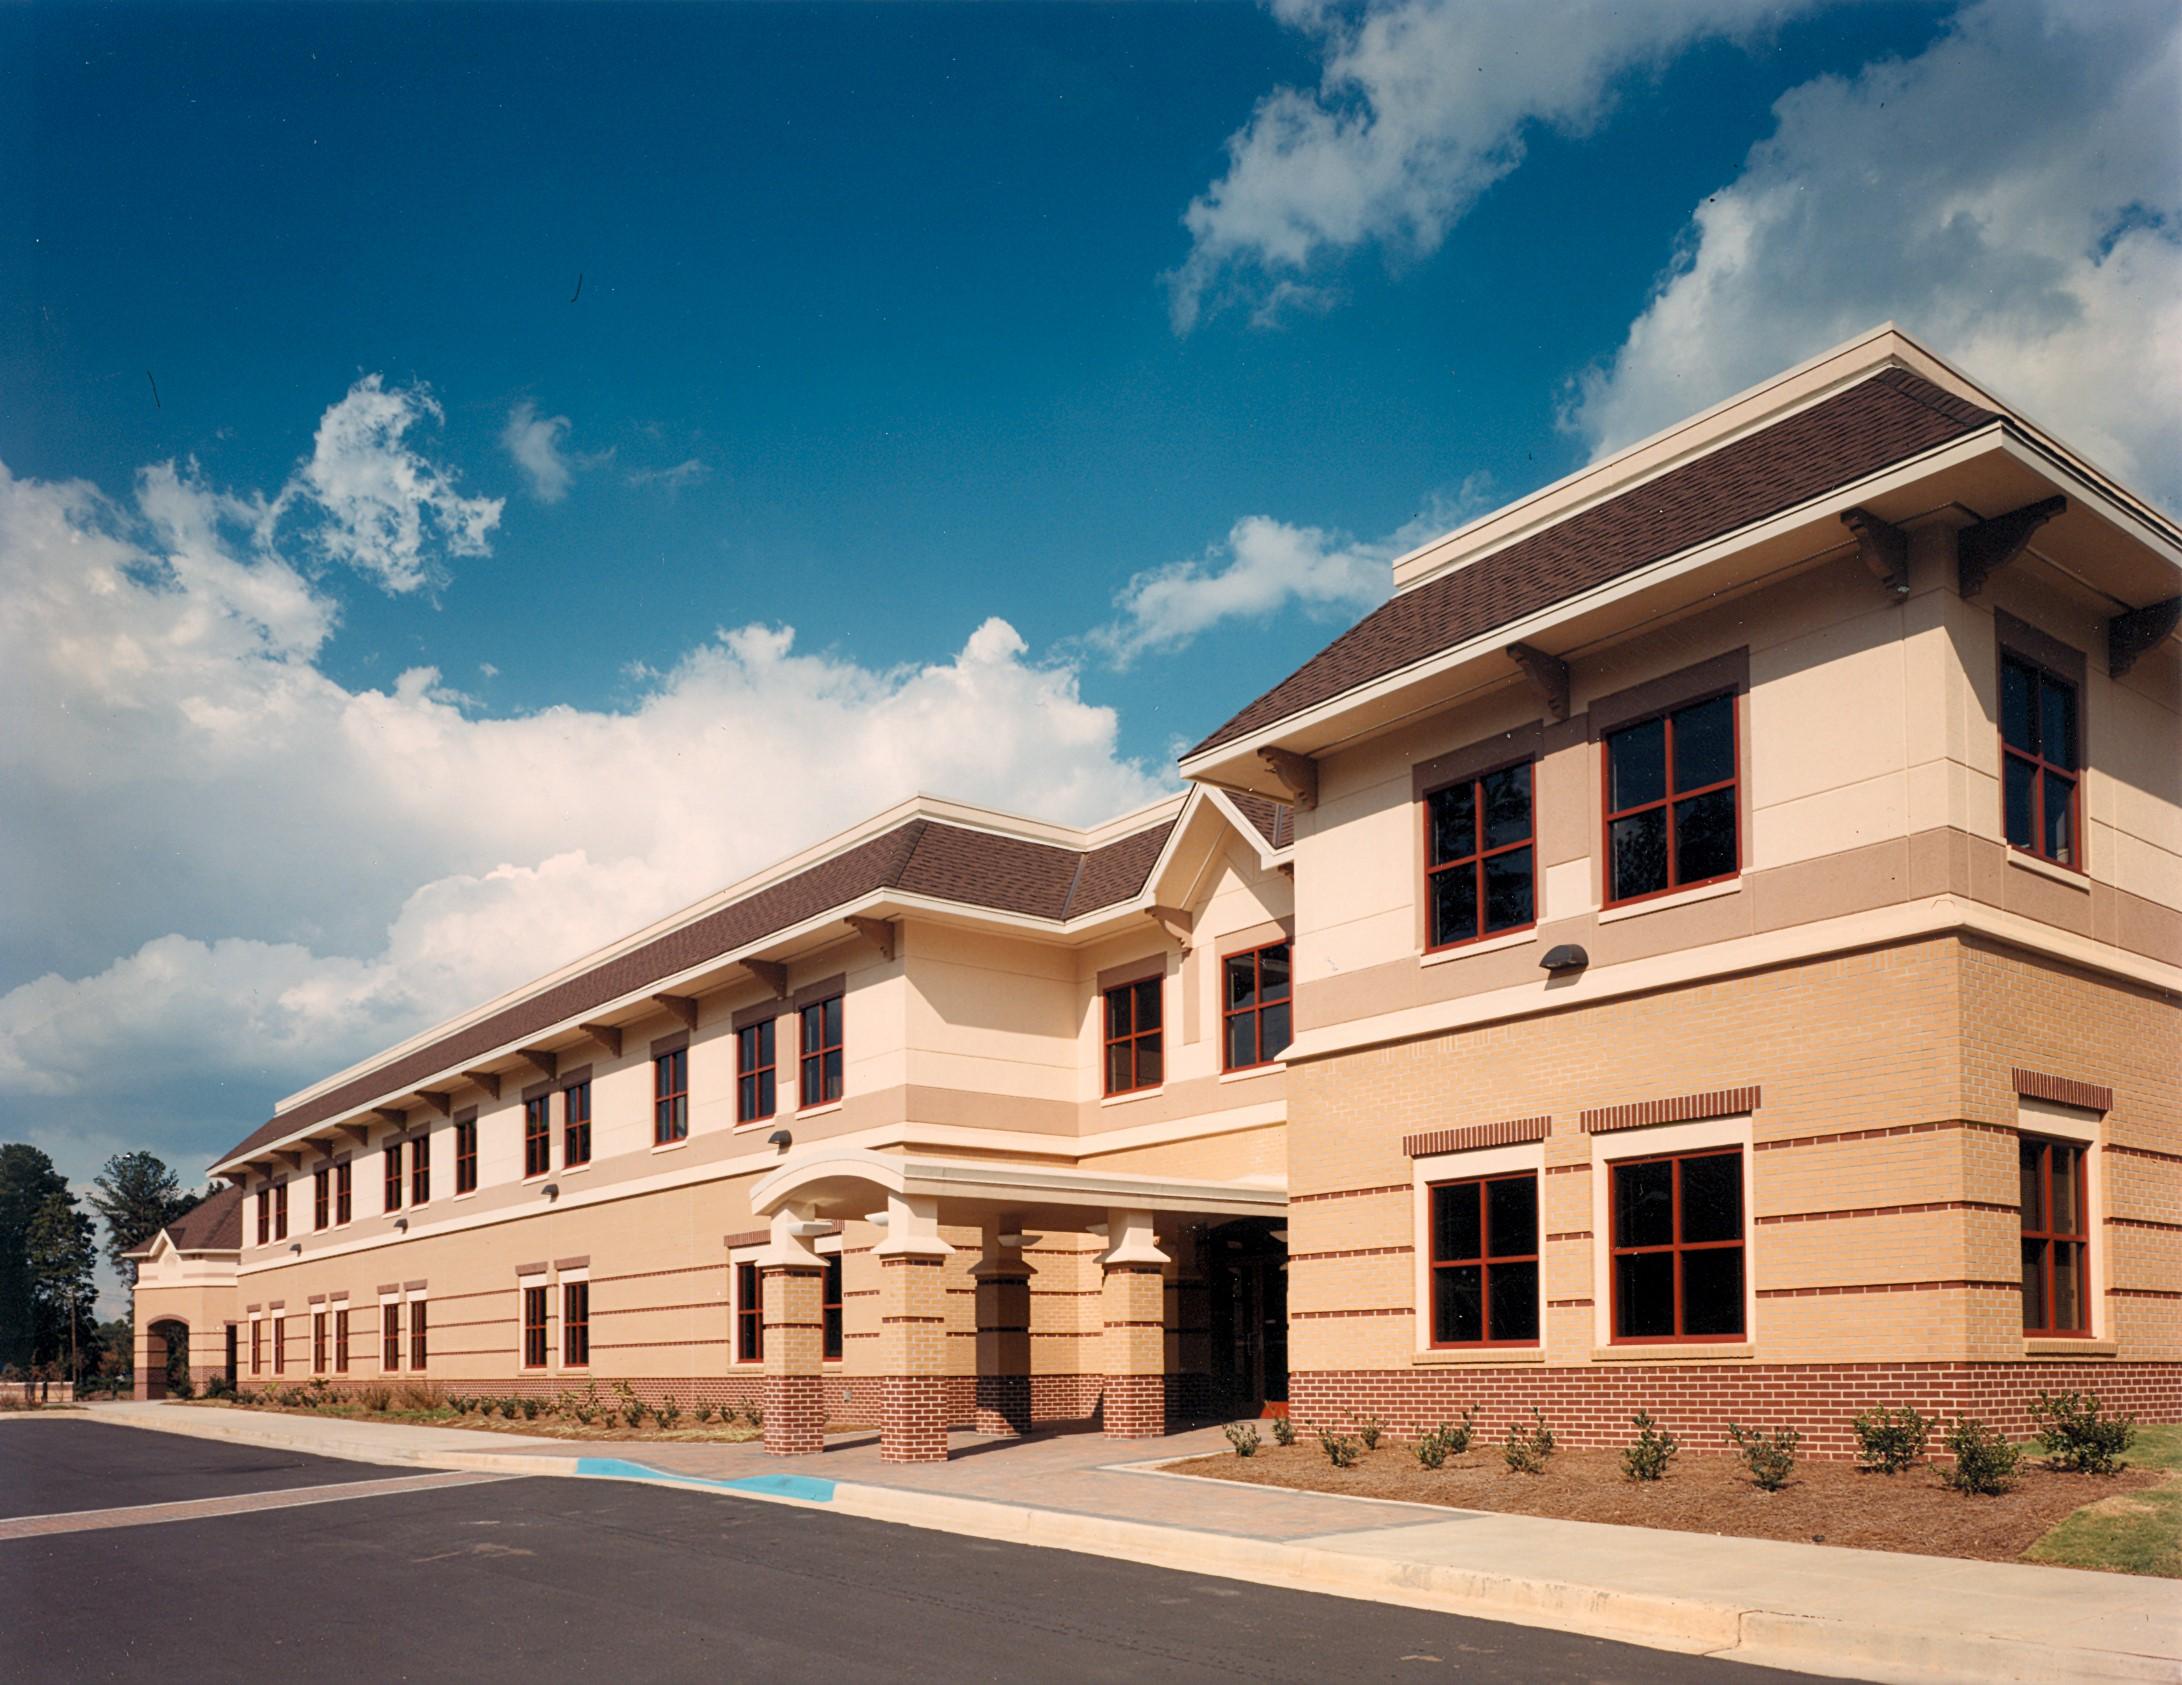 Davis Academy - Lower School - Long Elevation.jpg